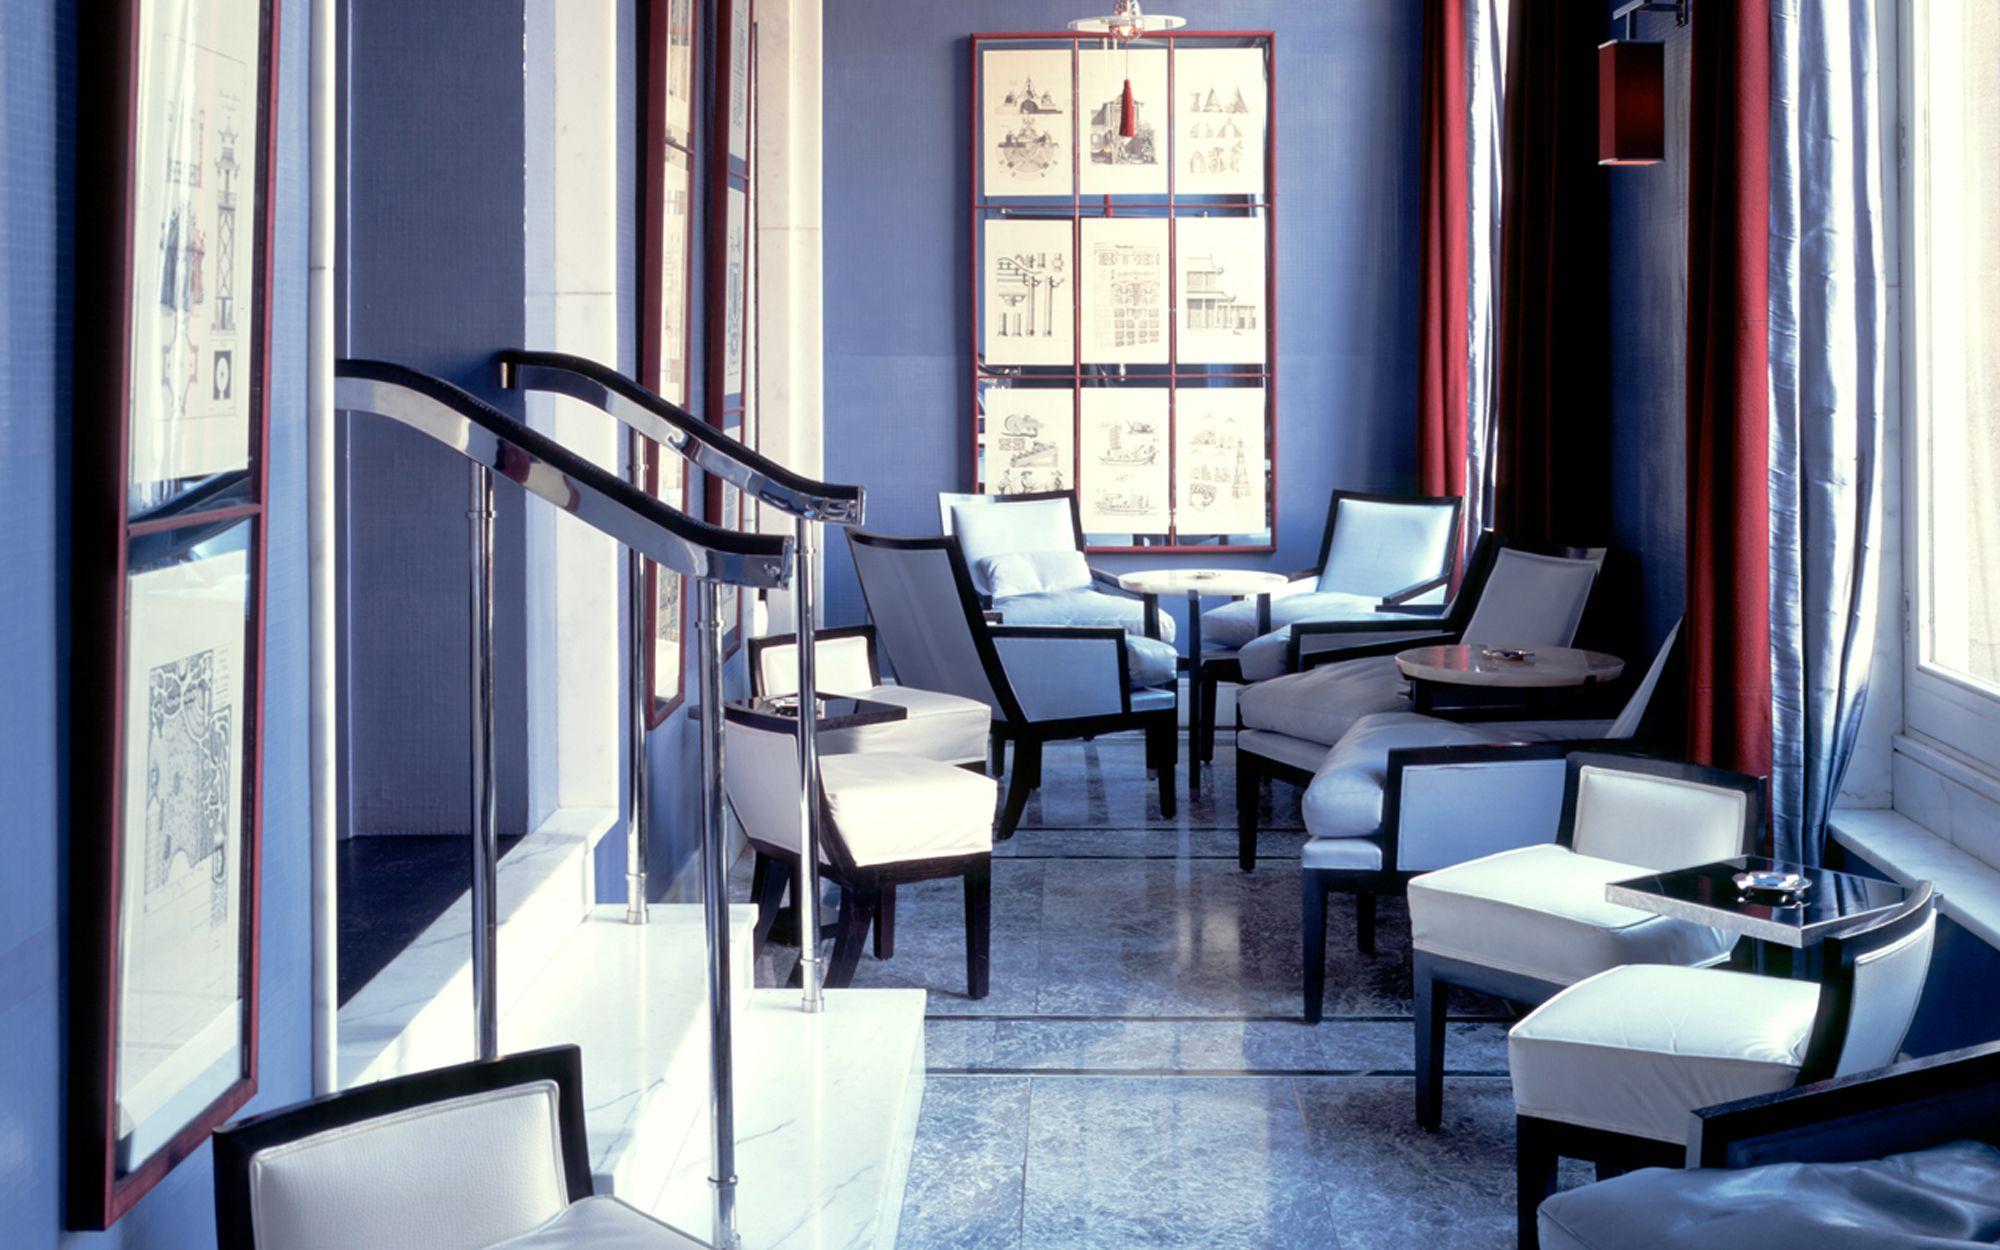 berkeley interior design. David Collins - The Blue Bar, Berkeley Hotel, Knightsbridge, London, UK · Restaurant Interior DesignBar Design O